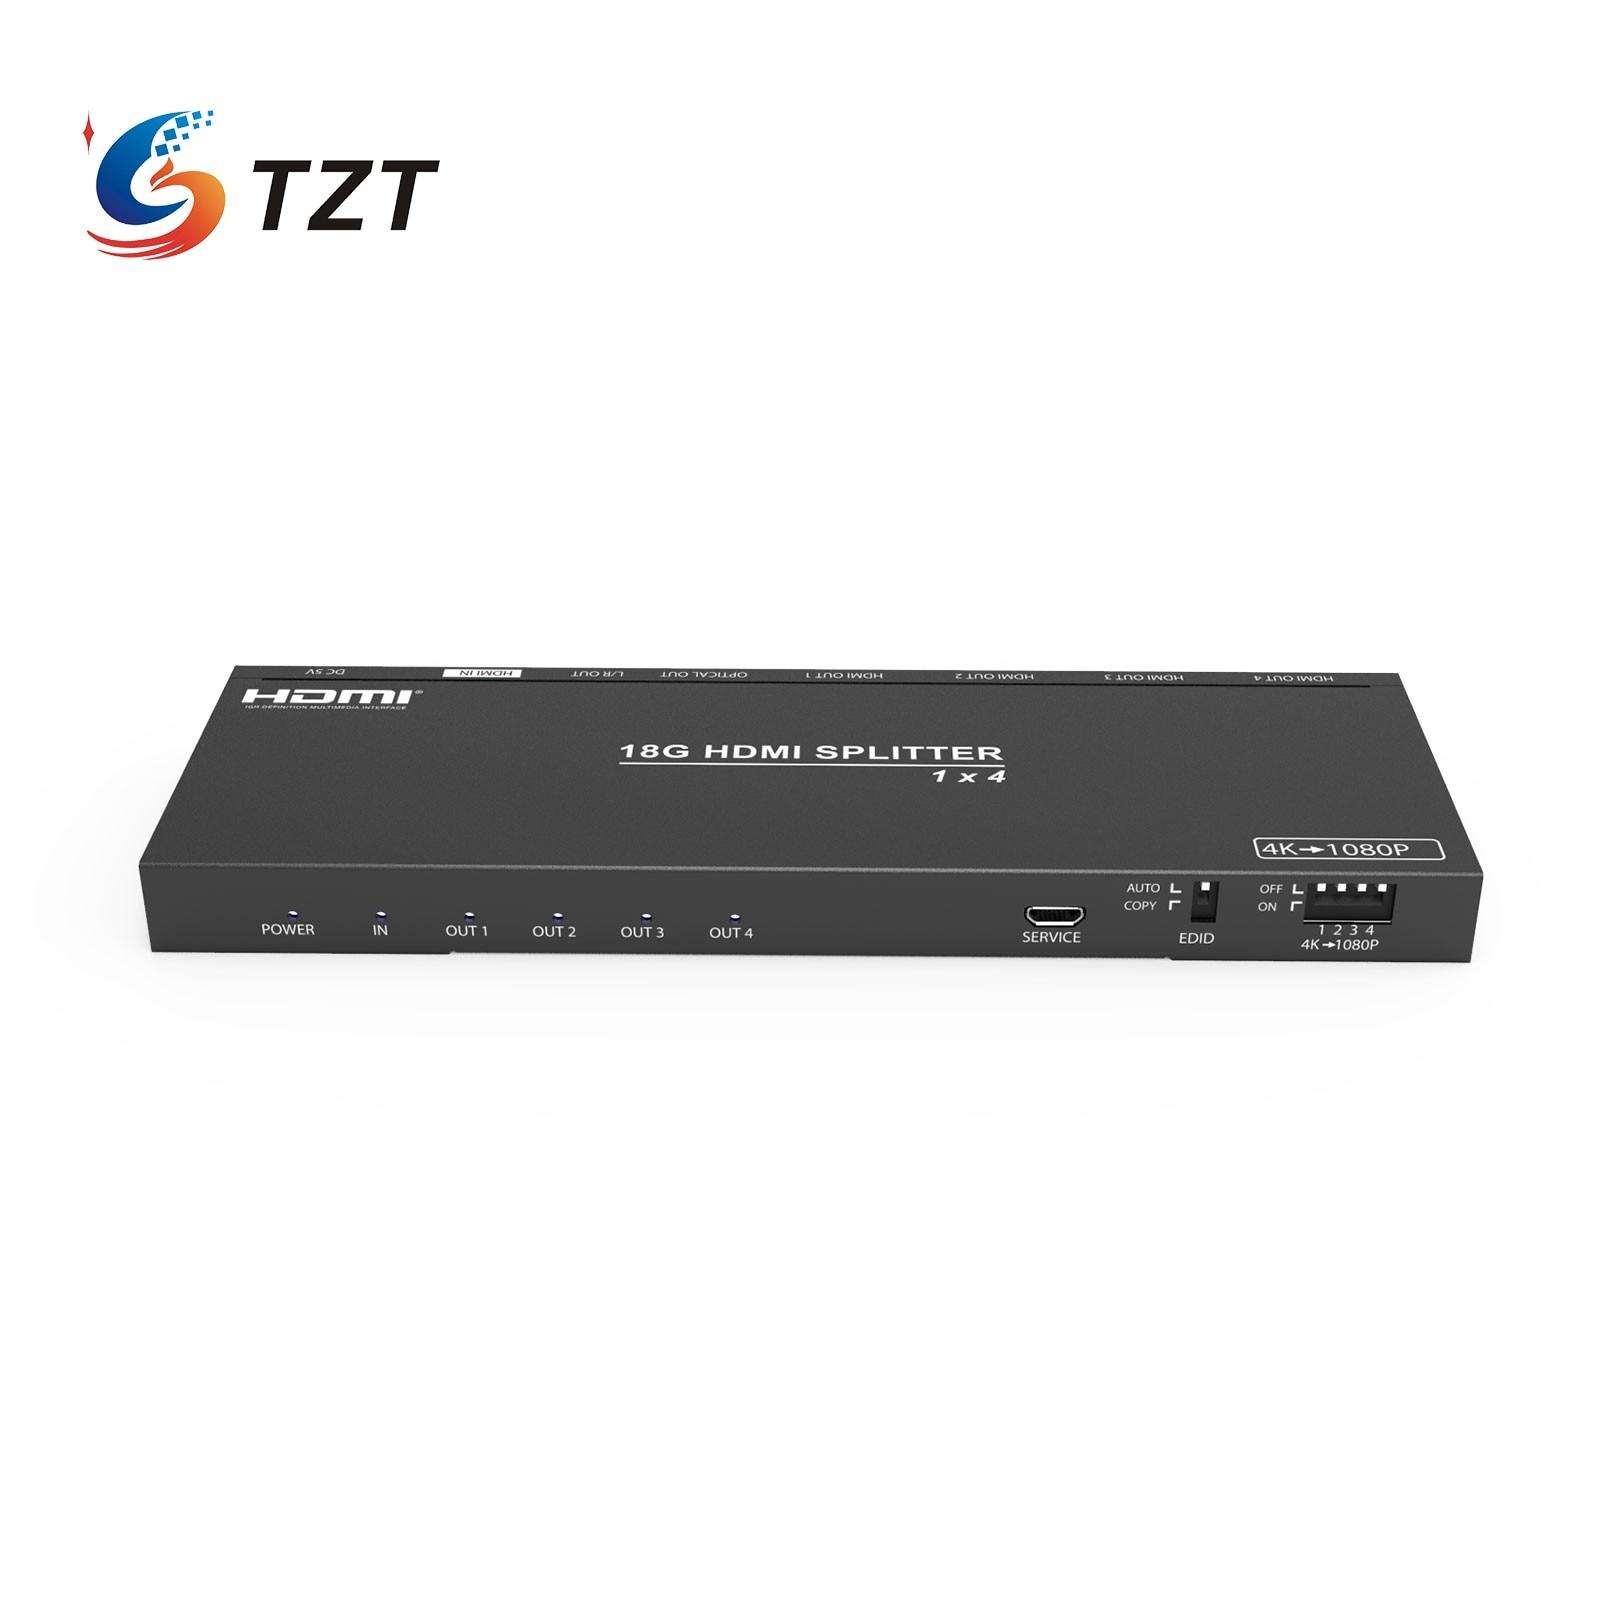 TZT HDMI-متوافق الفاصل HDCP 1 في 4 خارج محول محول 1x4 دعم 4K 60Hz فصل الصوت ل Dolby 5.1 HDV-B14SA